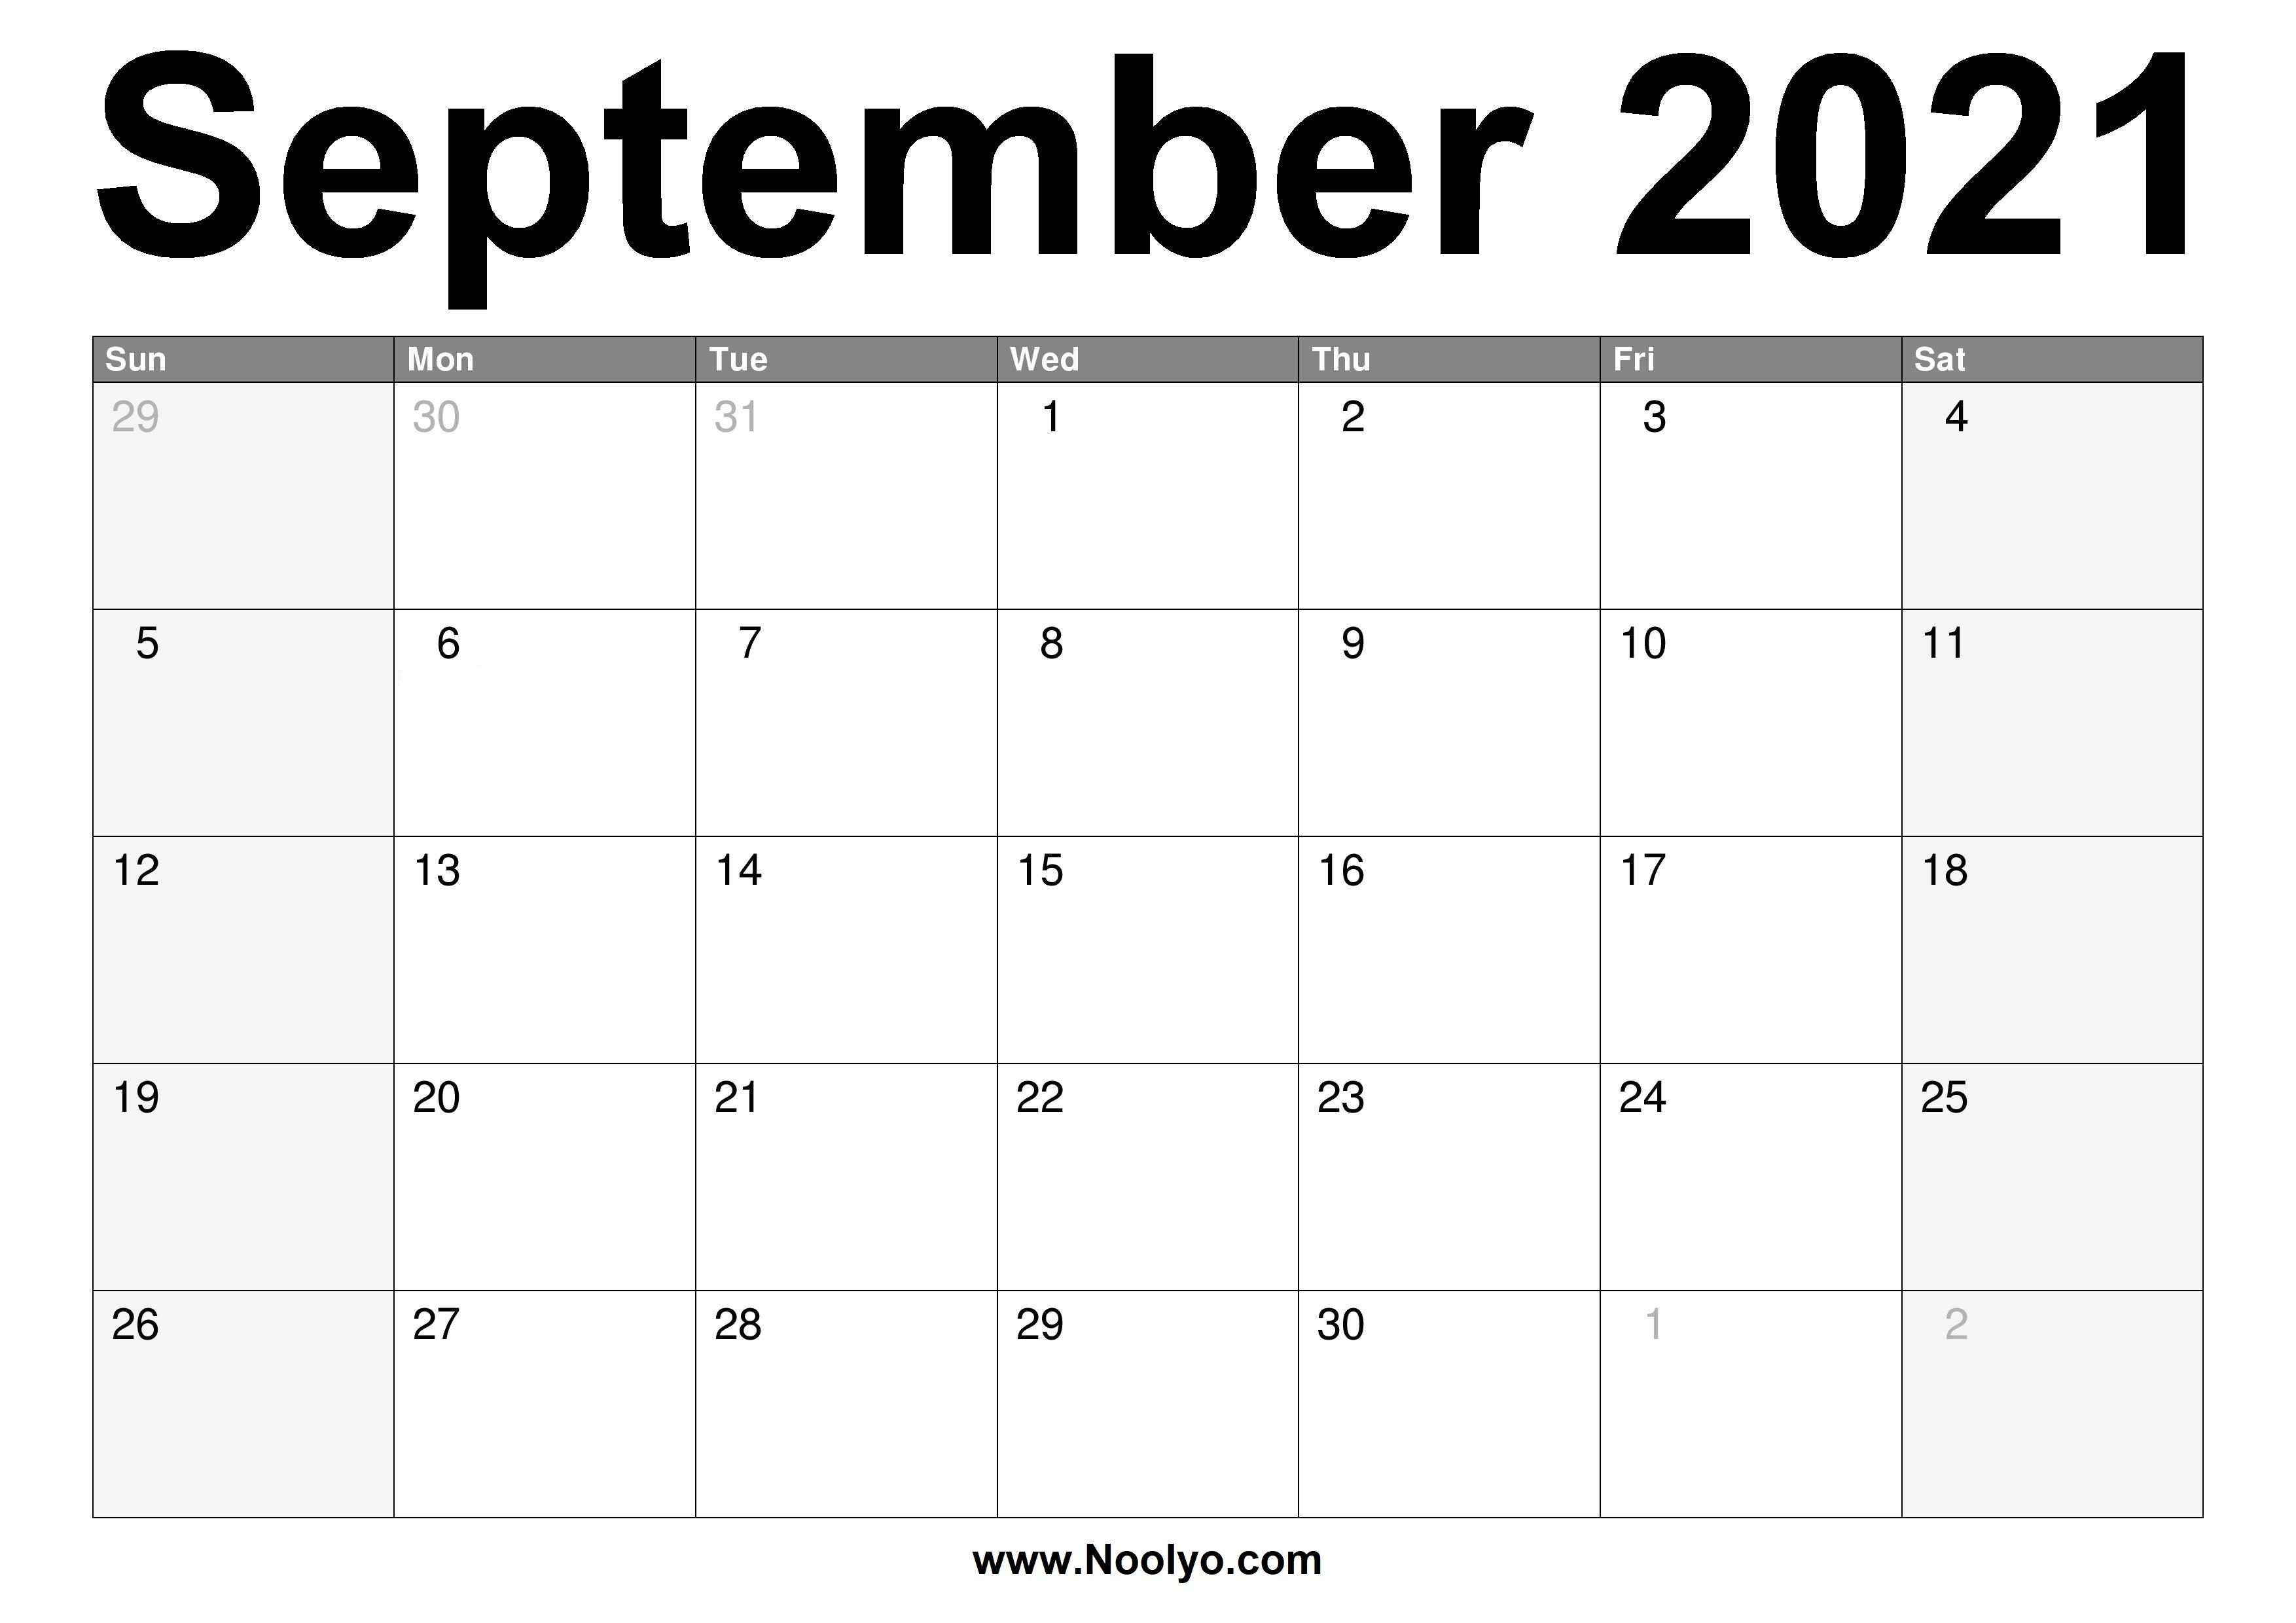 September 2021 Calendar Printable - Free Download - Noolyo September To December 2021 Calendar